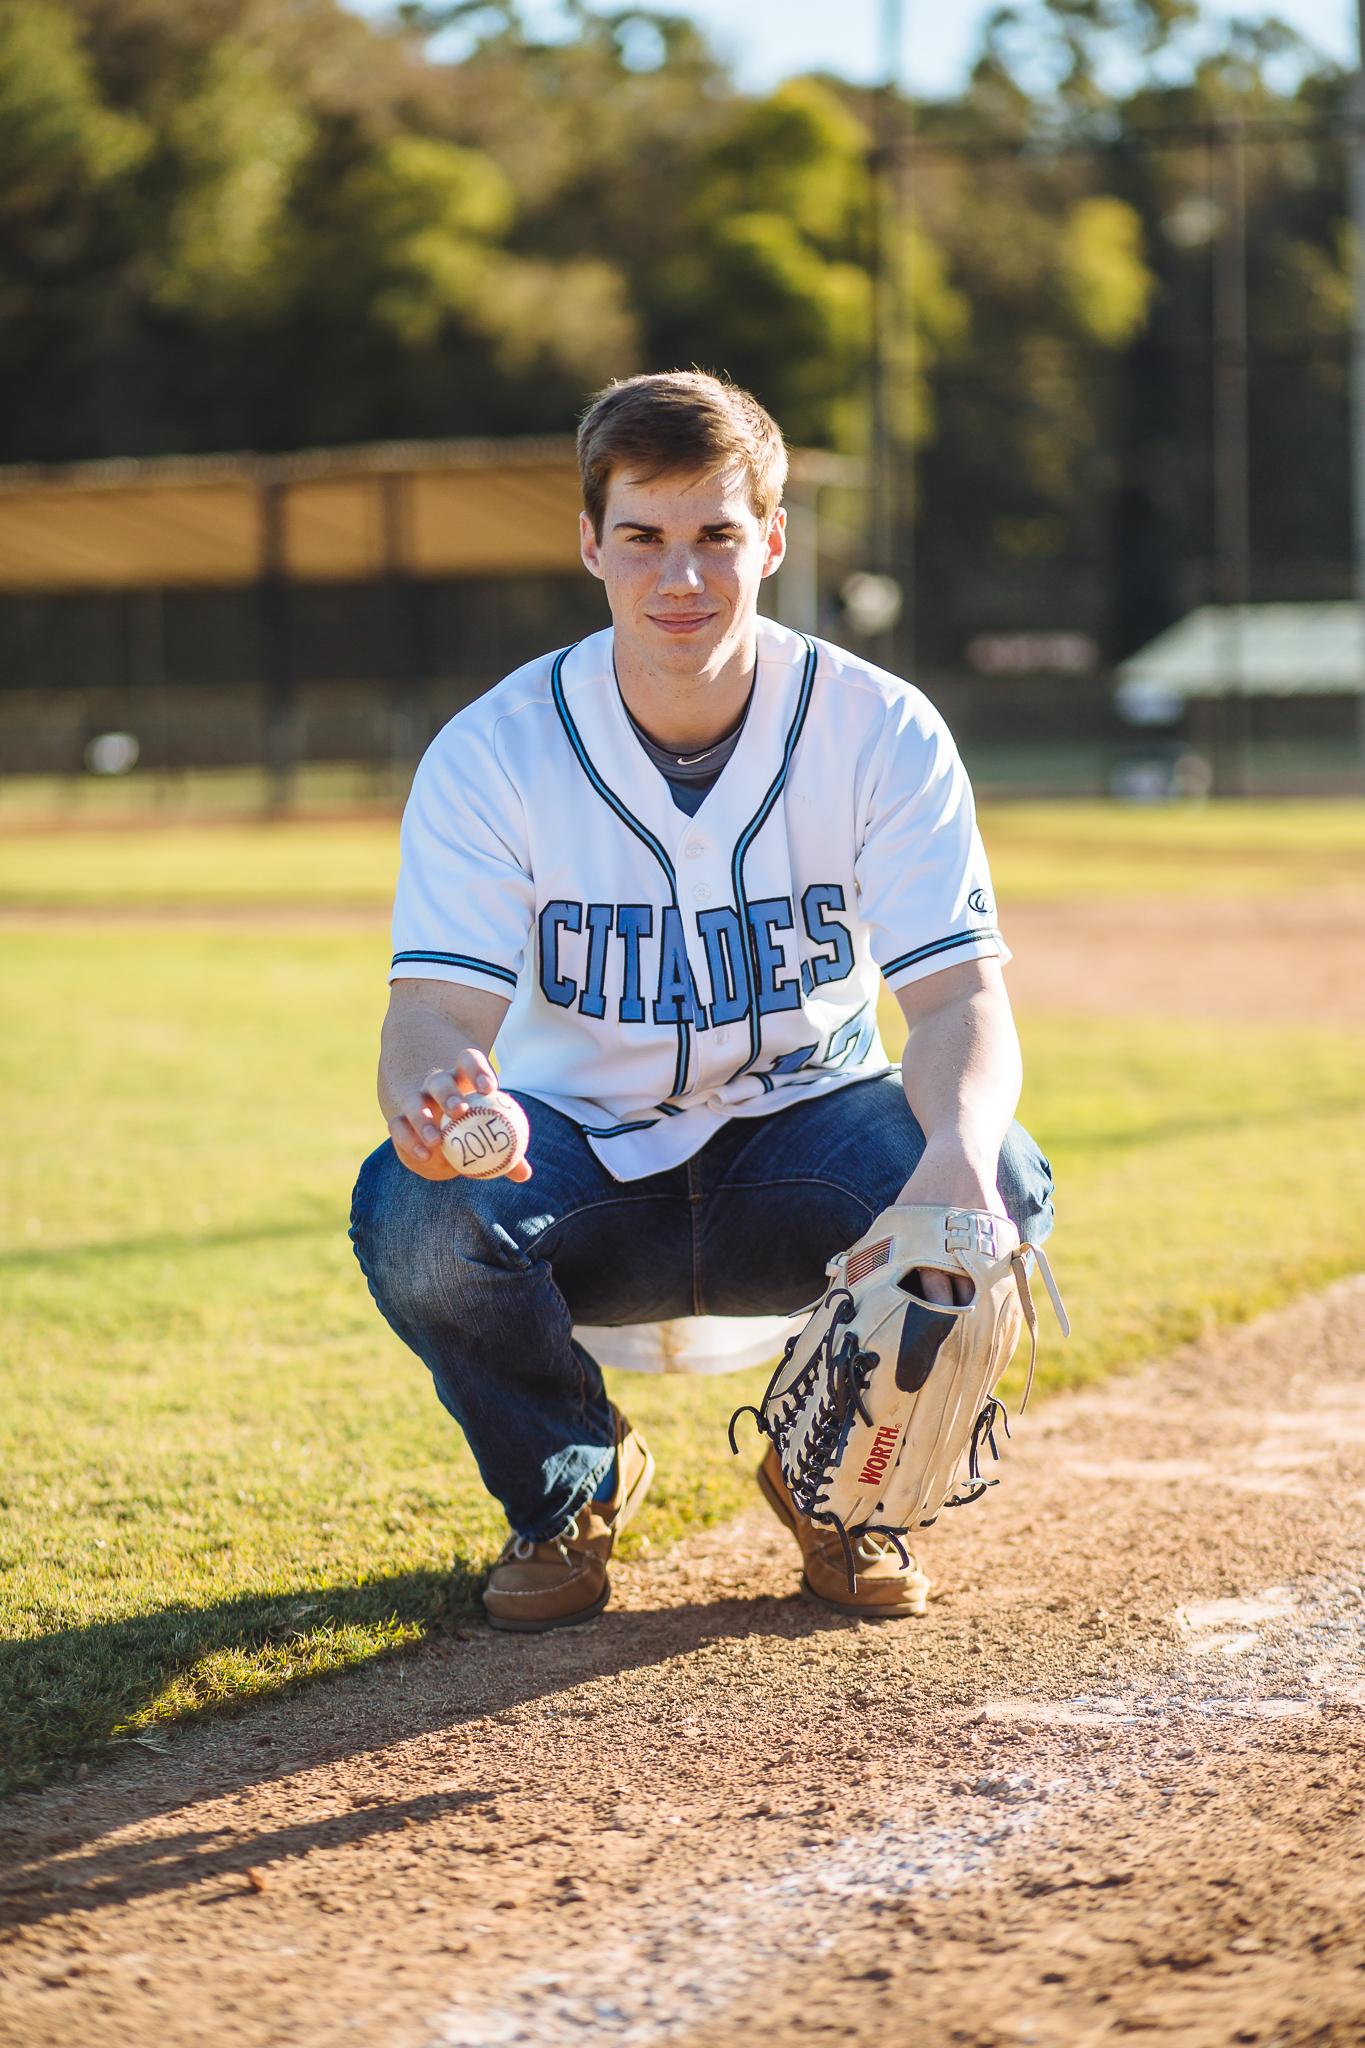 baseball_senior_photo_homeschool_GA_barn_senior photography_image-8.jpg